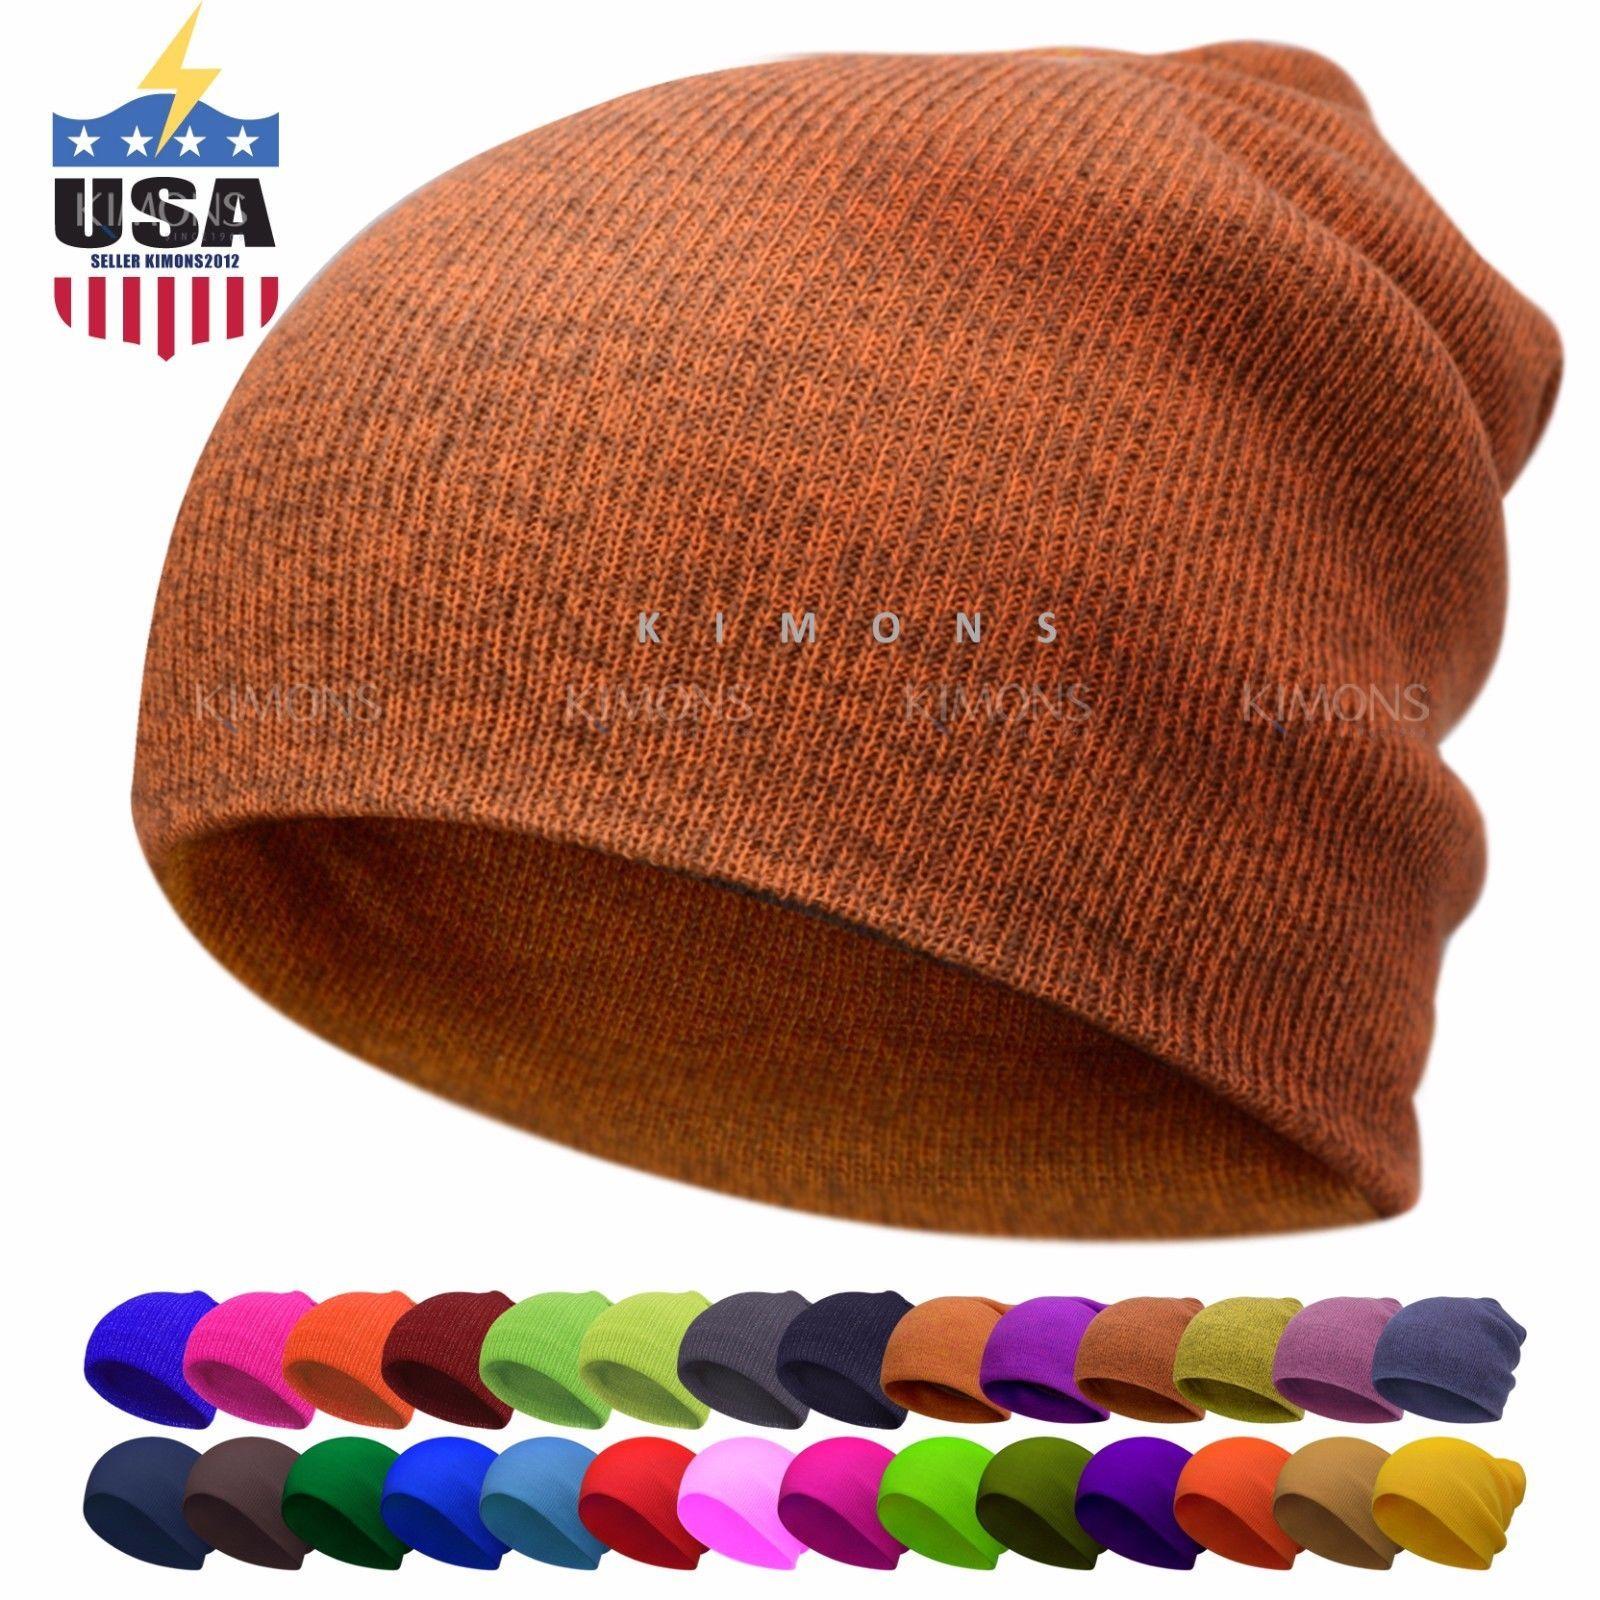 930678177e97c Glitter Beanie Plain Cuff Knit Hat Winter Cap Slouchy Skull Ski Hat Men  Women